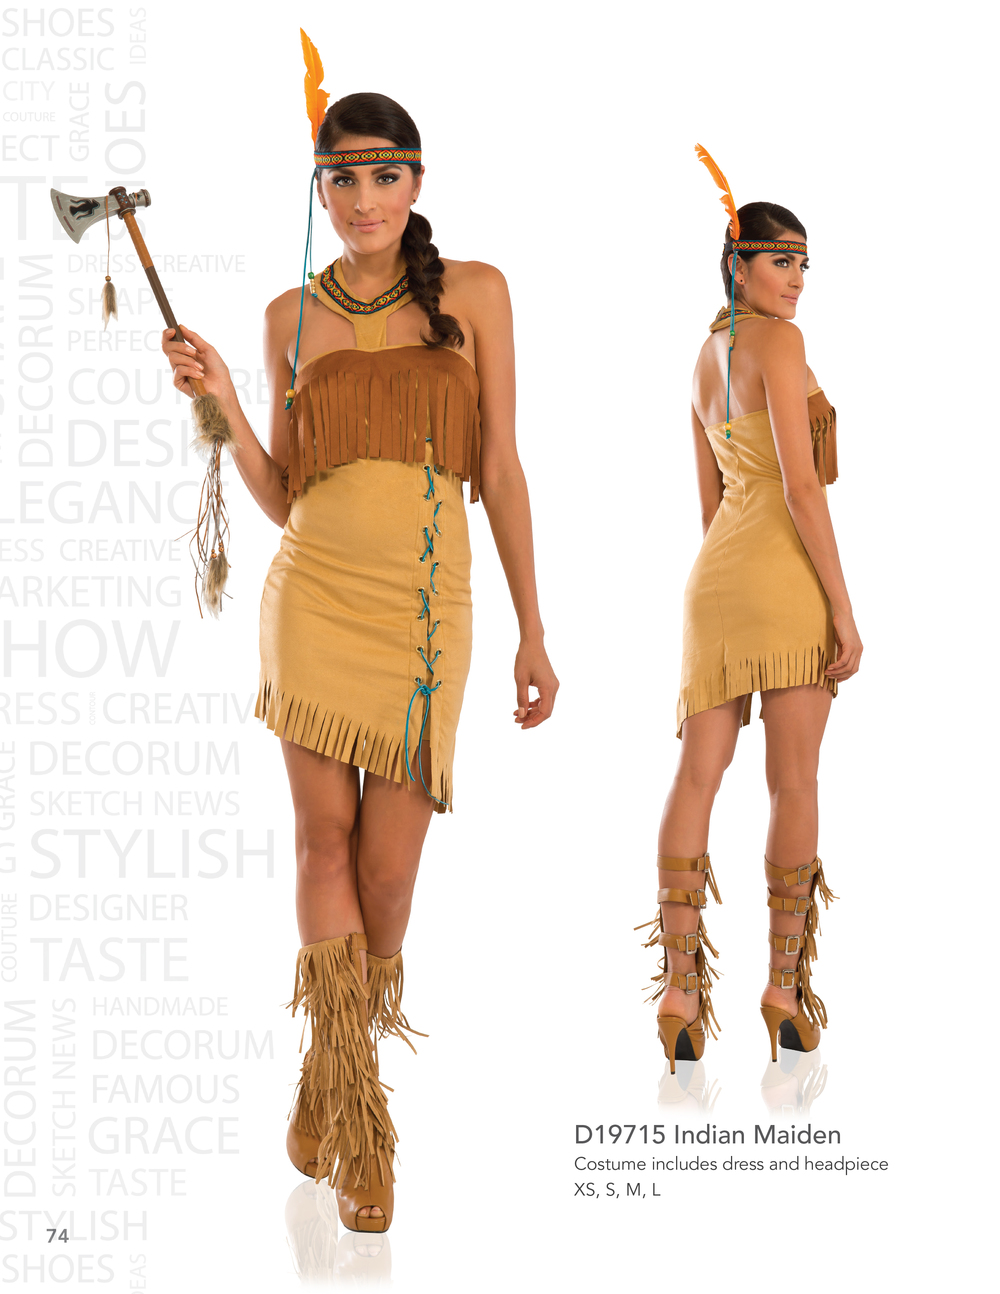 D19715 Indian Maiden